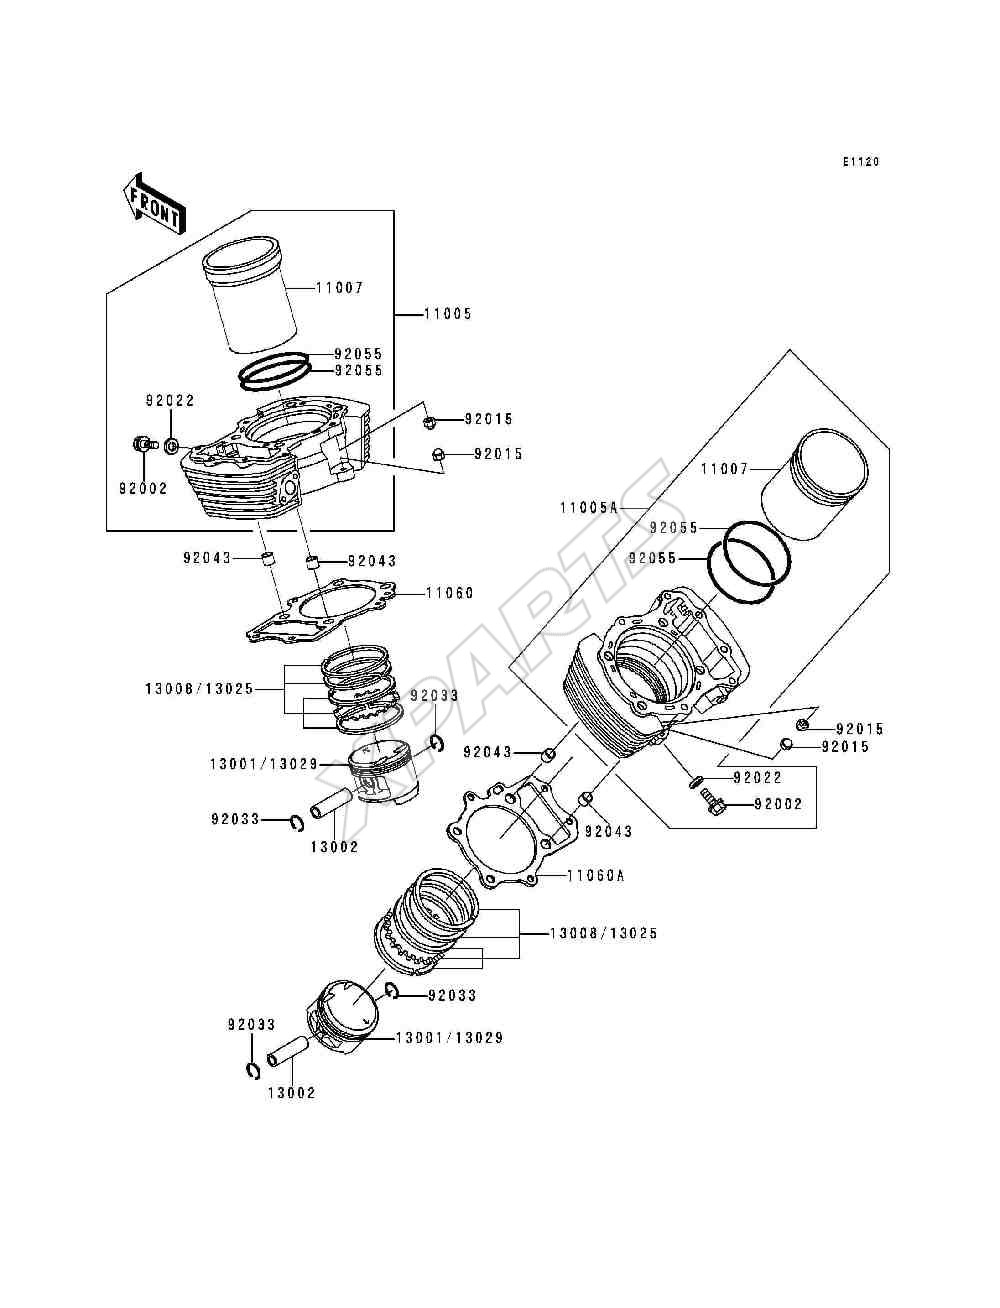 Harley Davidson 97 Sportster Wiring Diagram in addition Bmw E30 Fuse List besides 2001 Bmw 325i Bumper Diagram together with Bmw 318i Engine Wiring Harness together with Bmw E36 Ecu Wiring Diagram. on 1987 bmw 325i wiring diagram